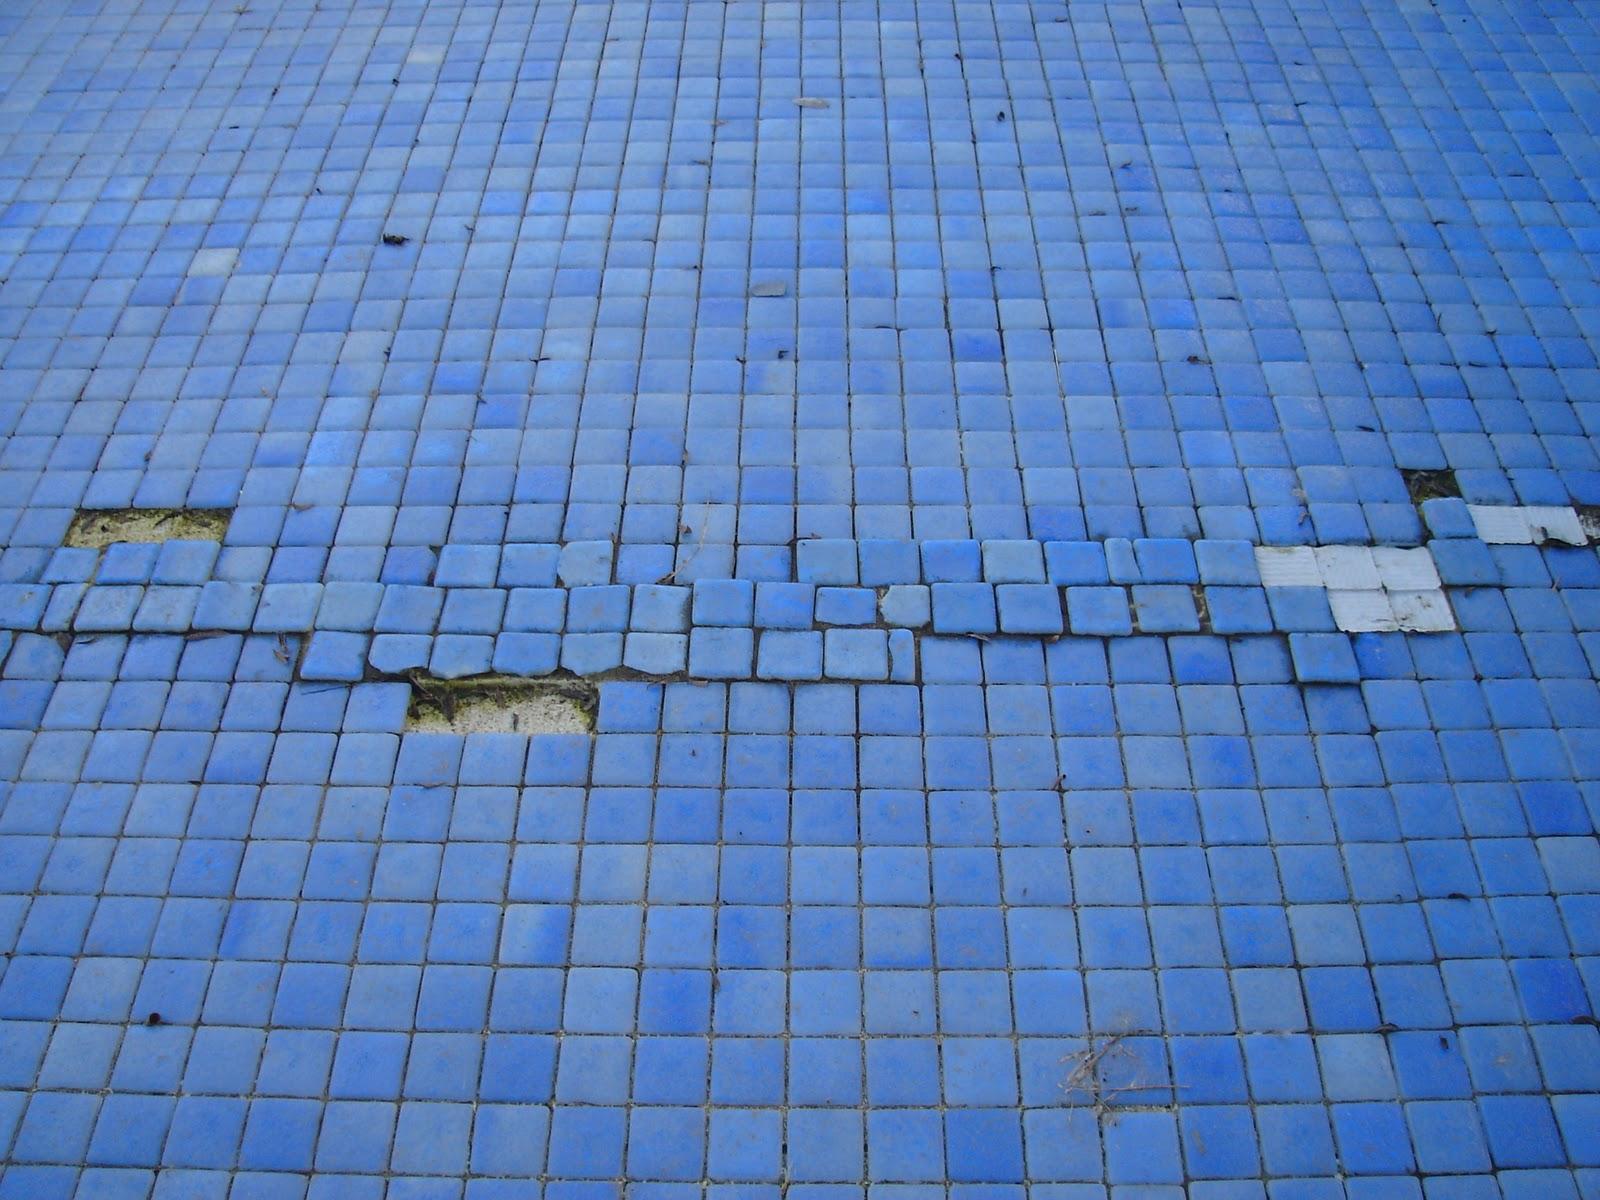 Gresite piscinas hd 1080p 4k foto - Gresite piscinas precio ...